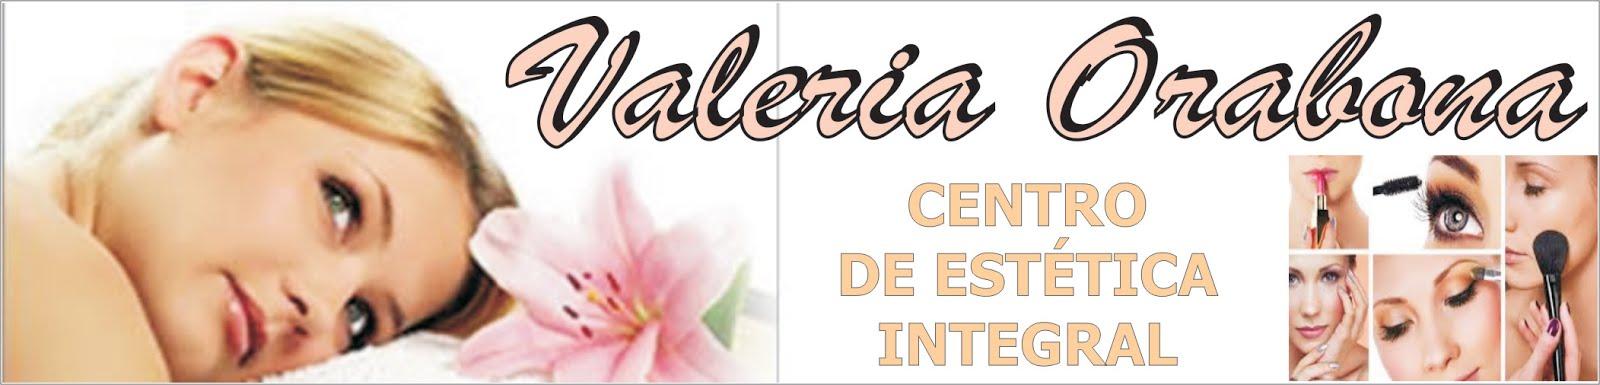 Centro de Estética Integral Valeria Orabona